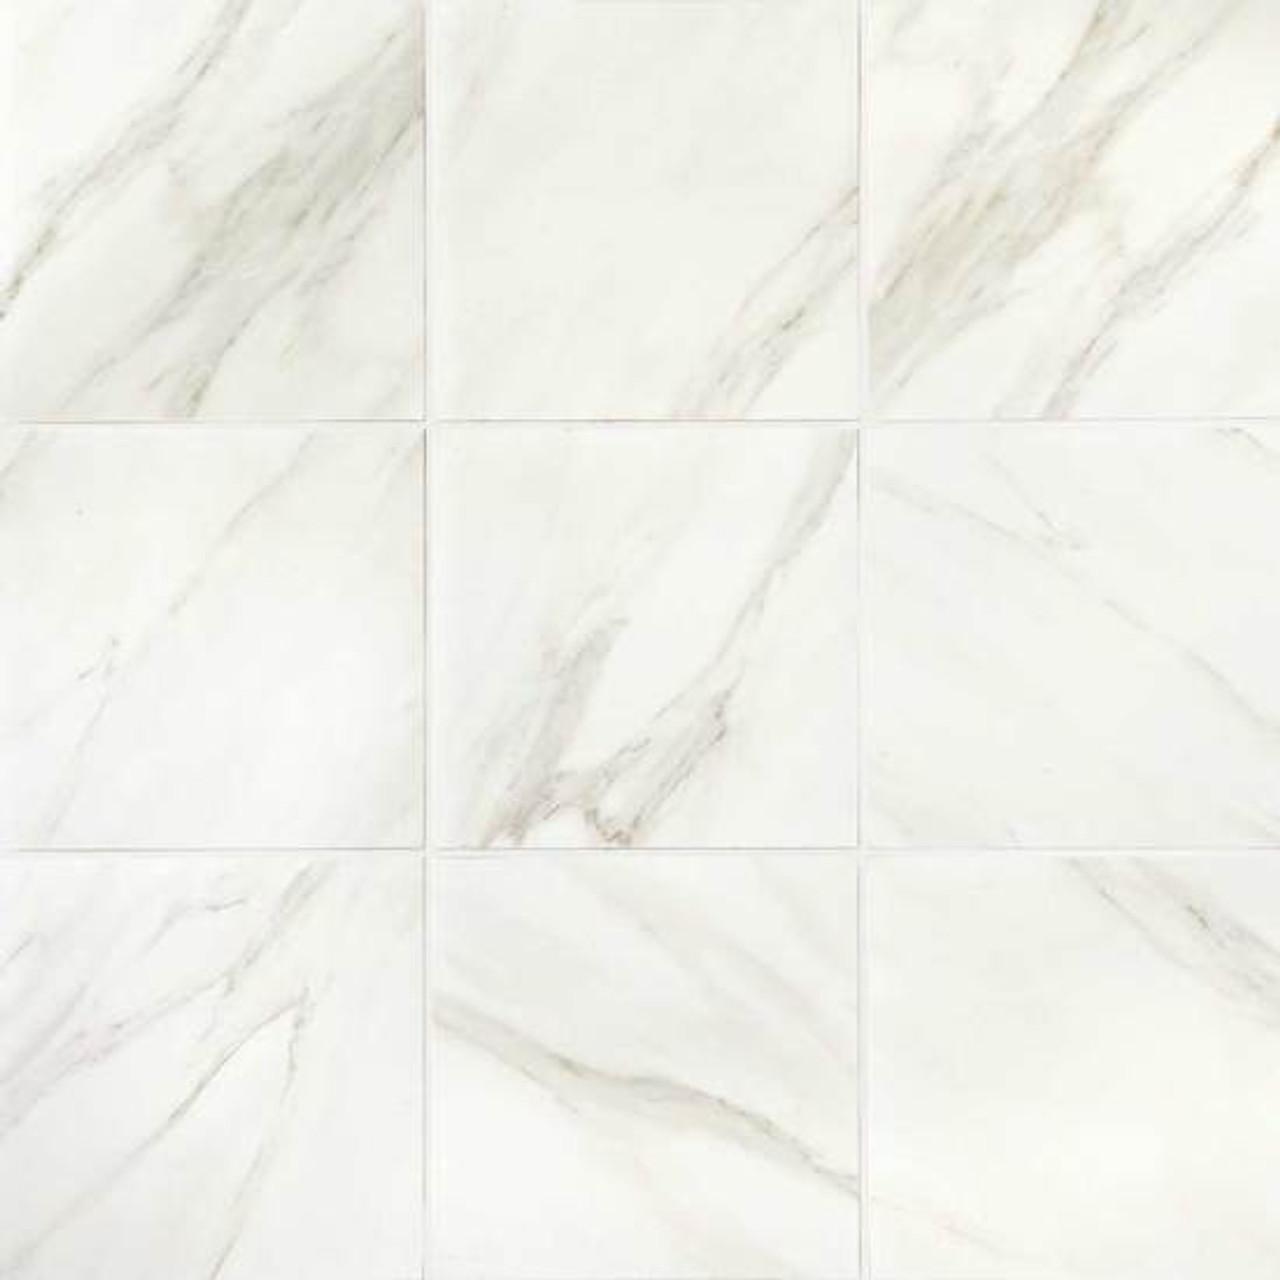 mirasol bianco carrara matte porcelain floor tile 24x24